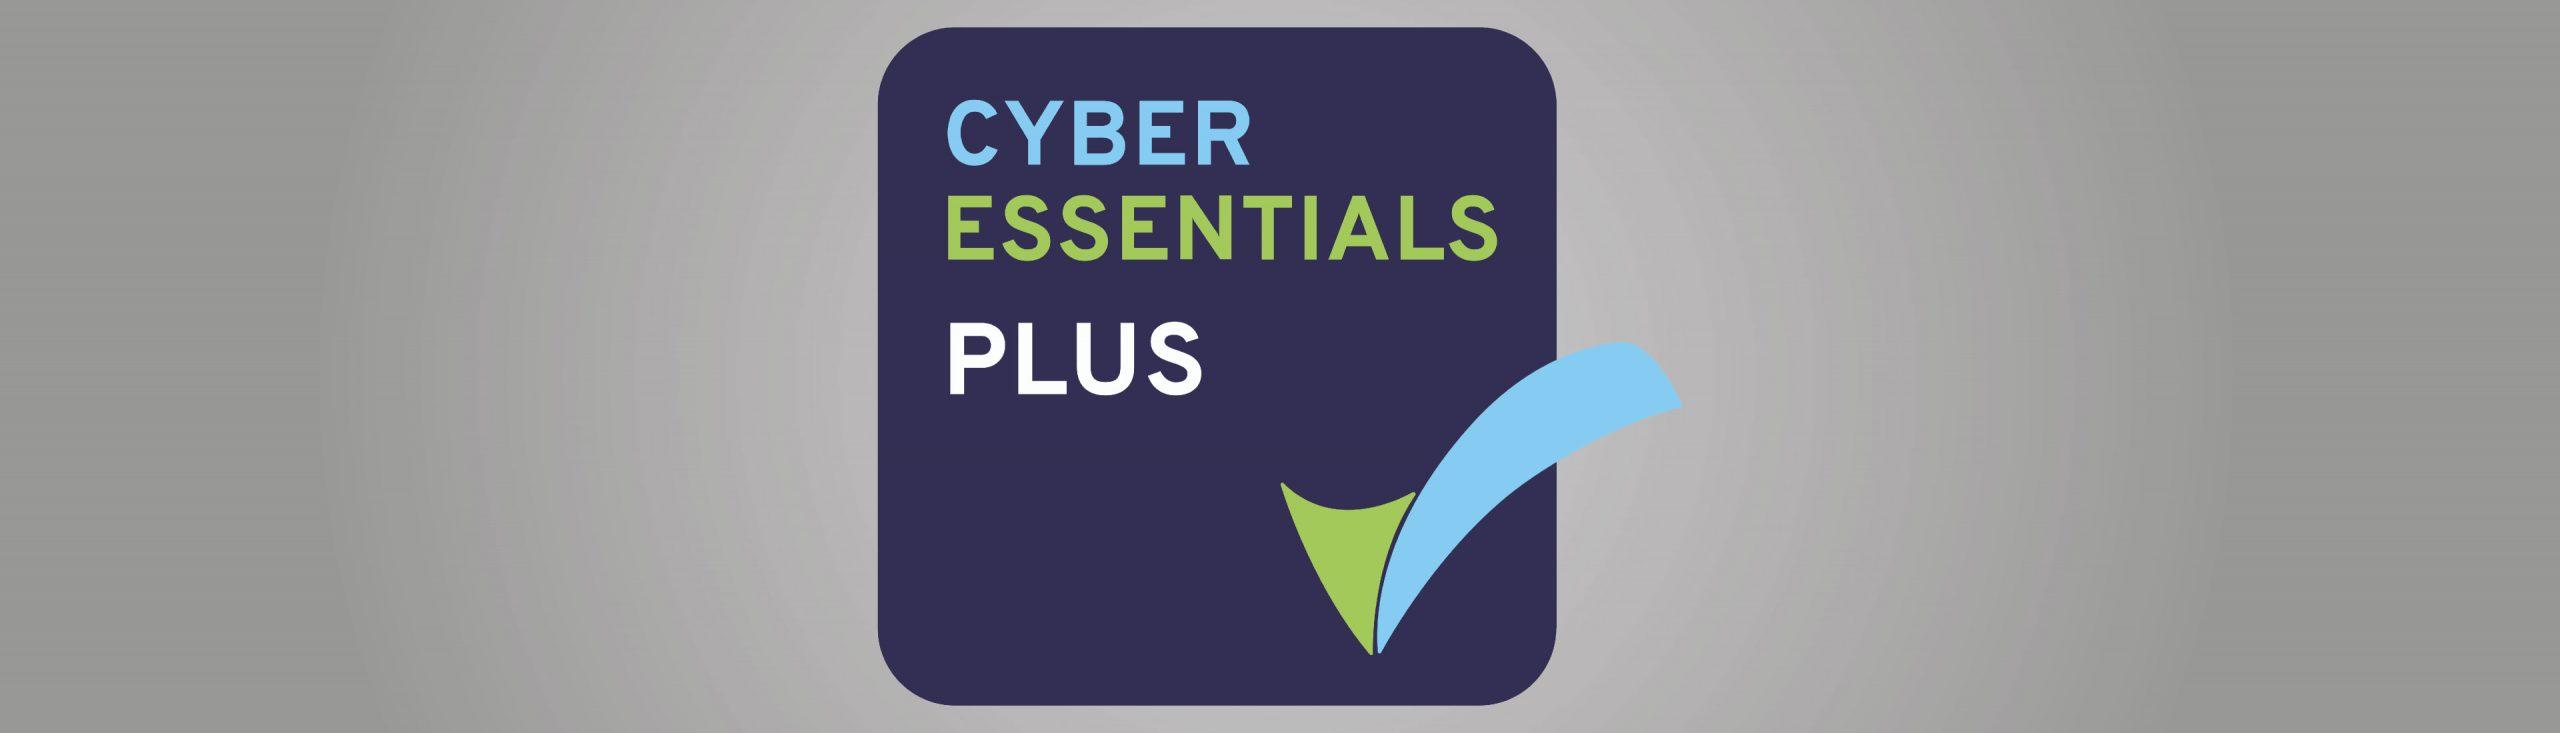 Plextek receives Cyber Essentials Plus Accreditation from IASME